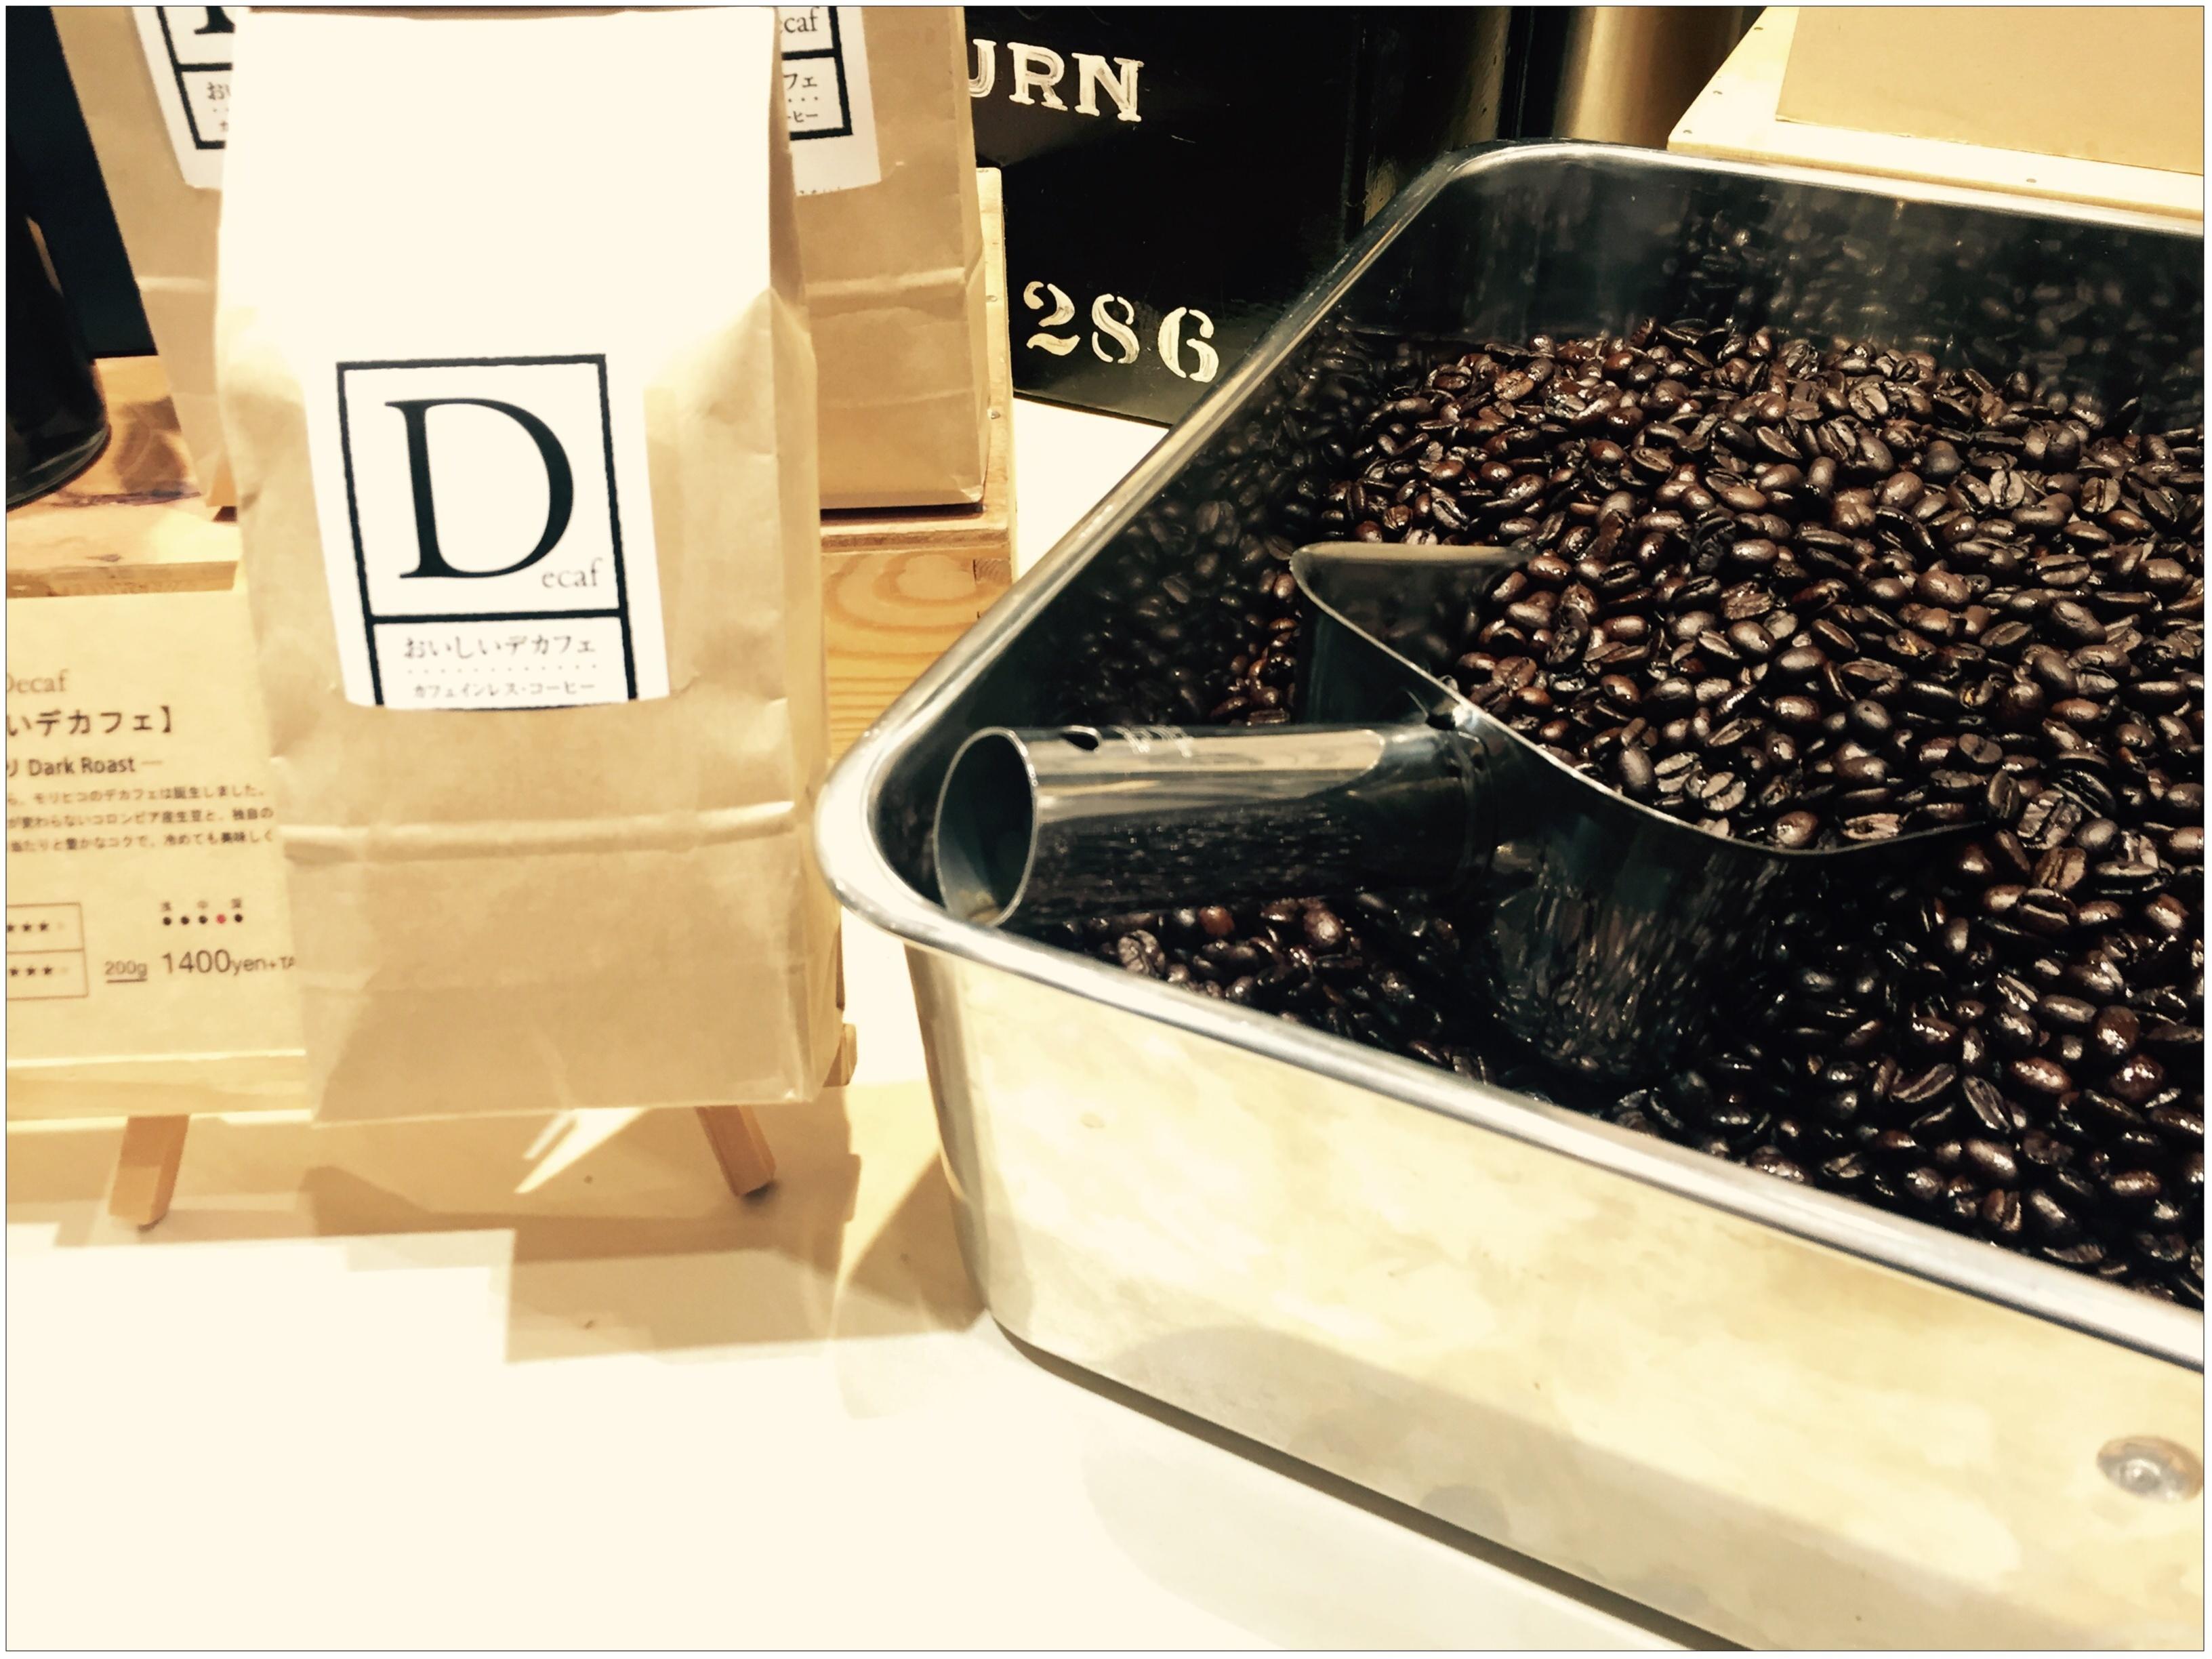 …ஐ コーヒー好きさんは急いで!札幌にしか出店していない【MORIHICO COFFEE & SOMETHING】が期間限定で東京にオープン♥️ஐ¨_1